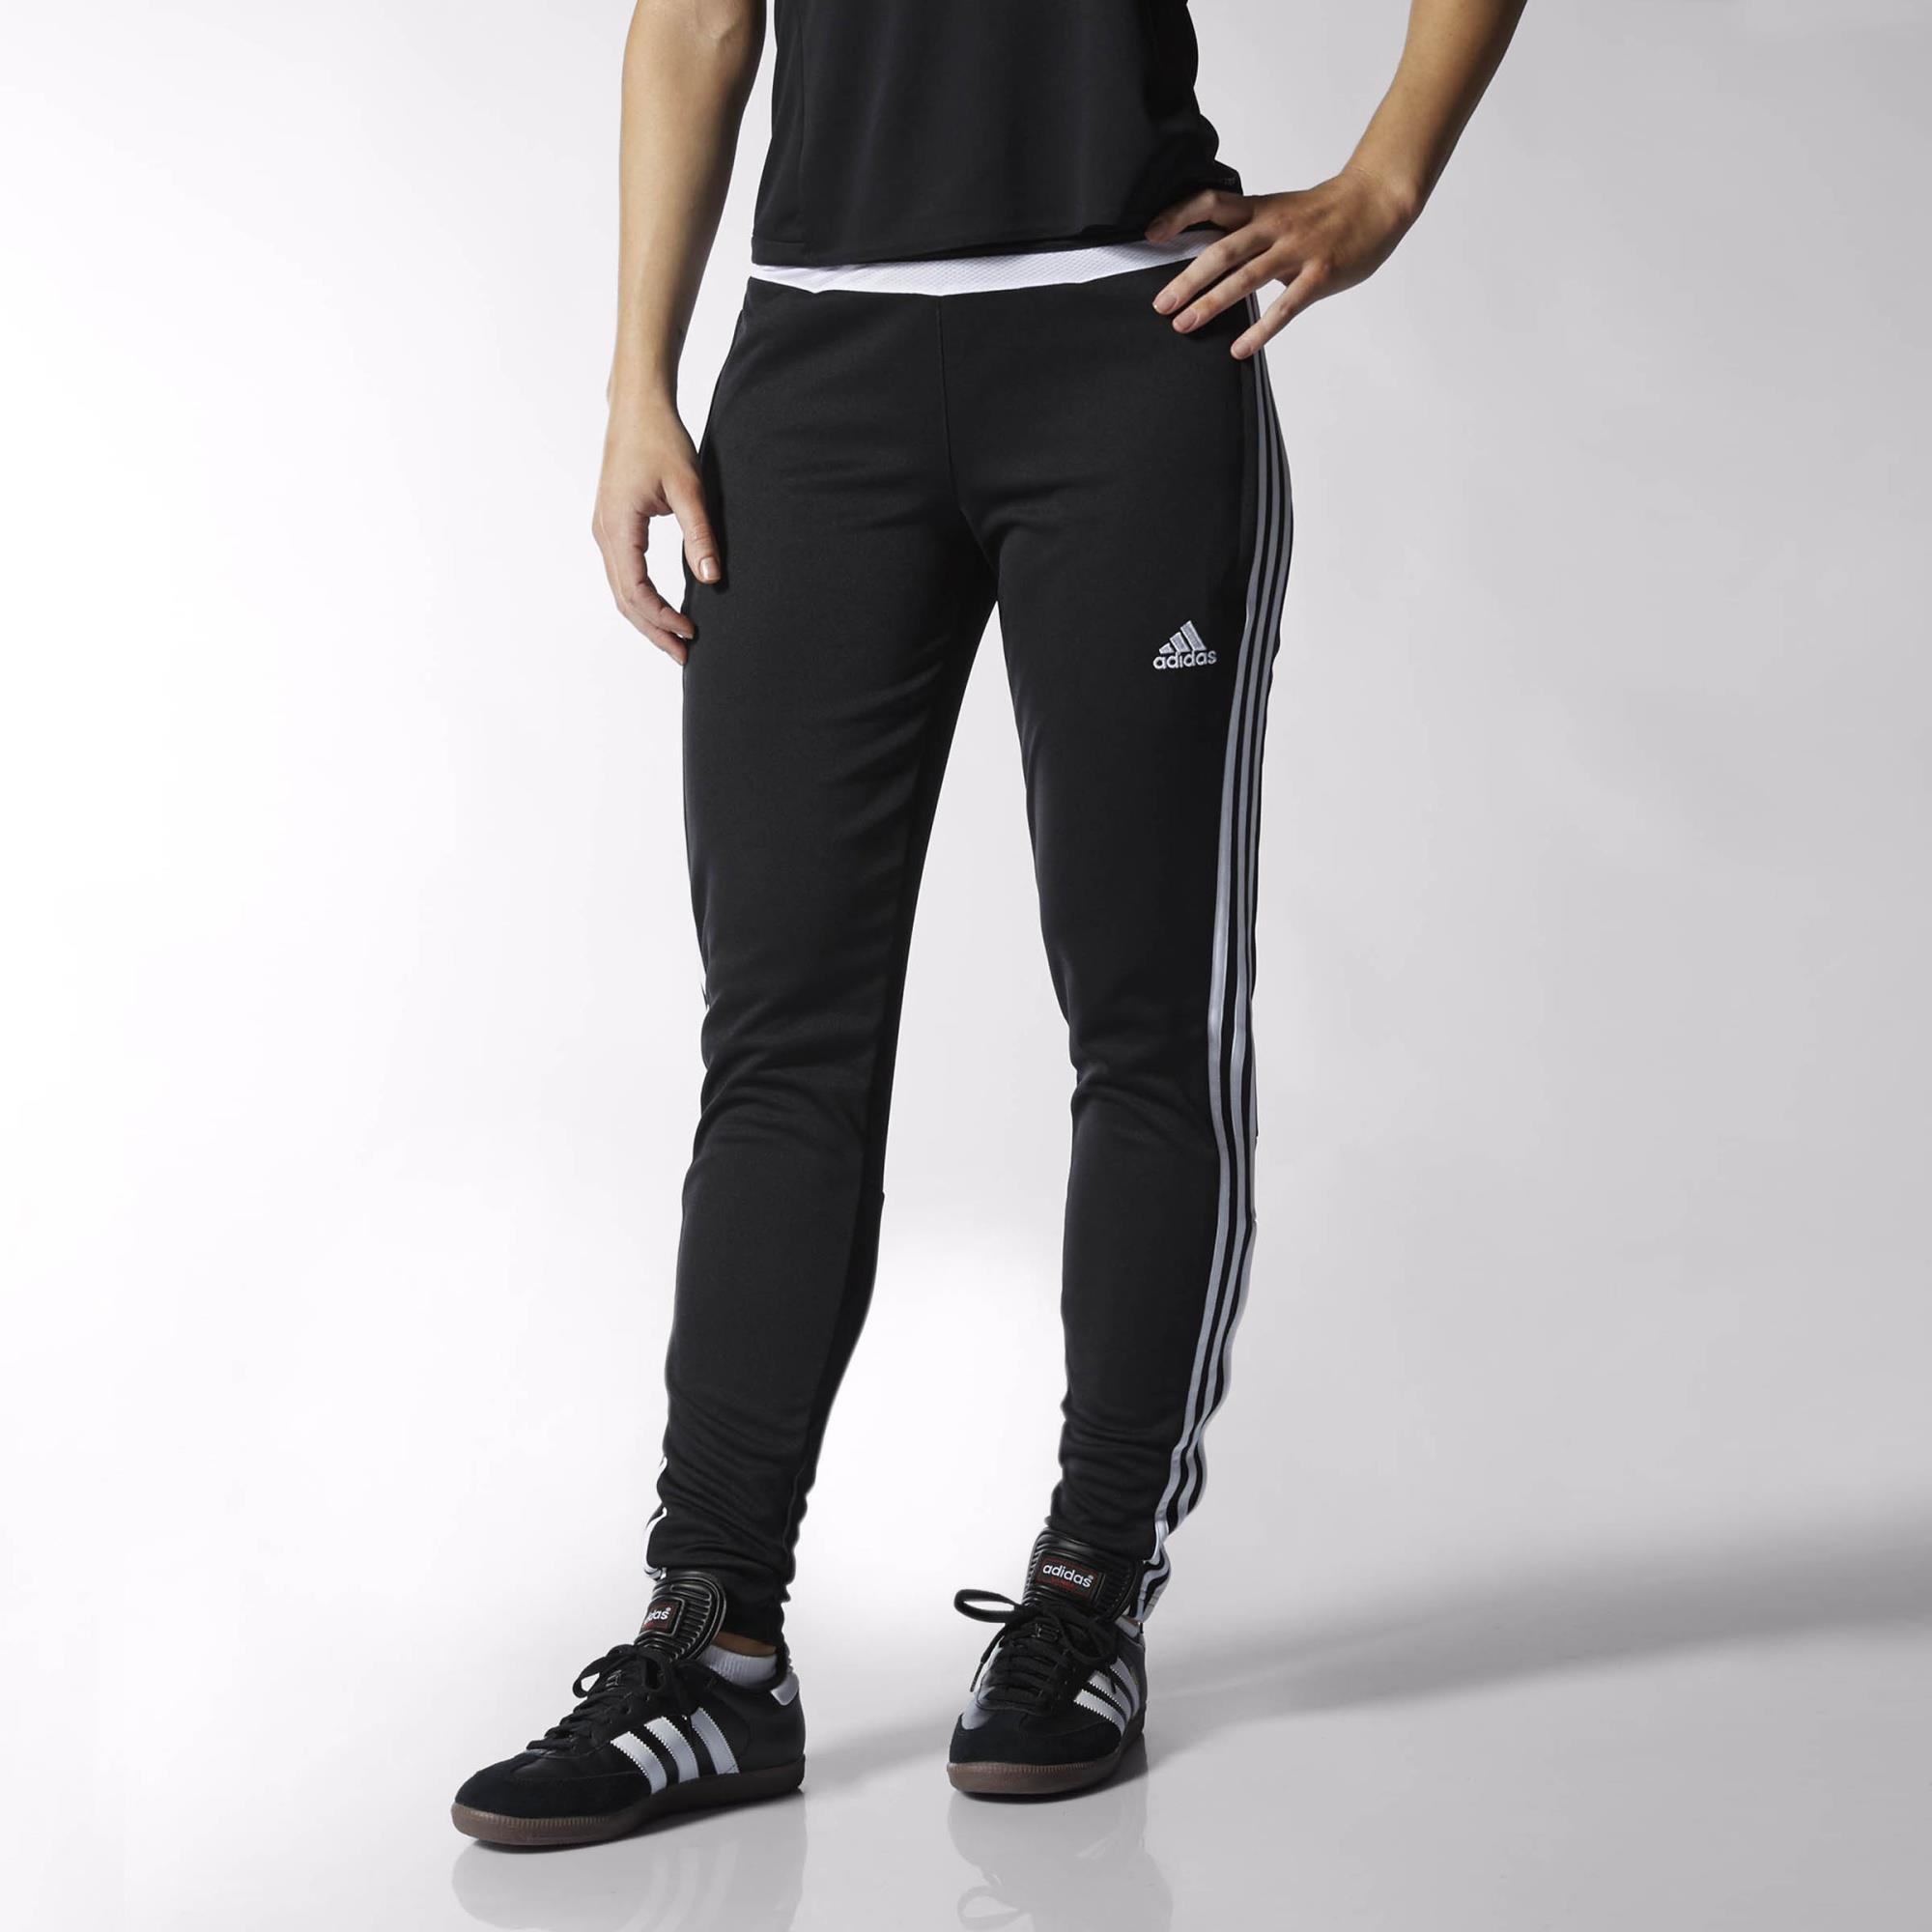 Buy adidas training pants tumblr   OFF30% Discounted 5c79cc2103461